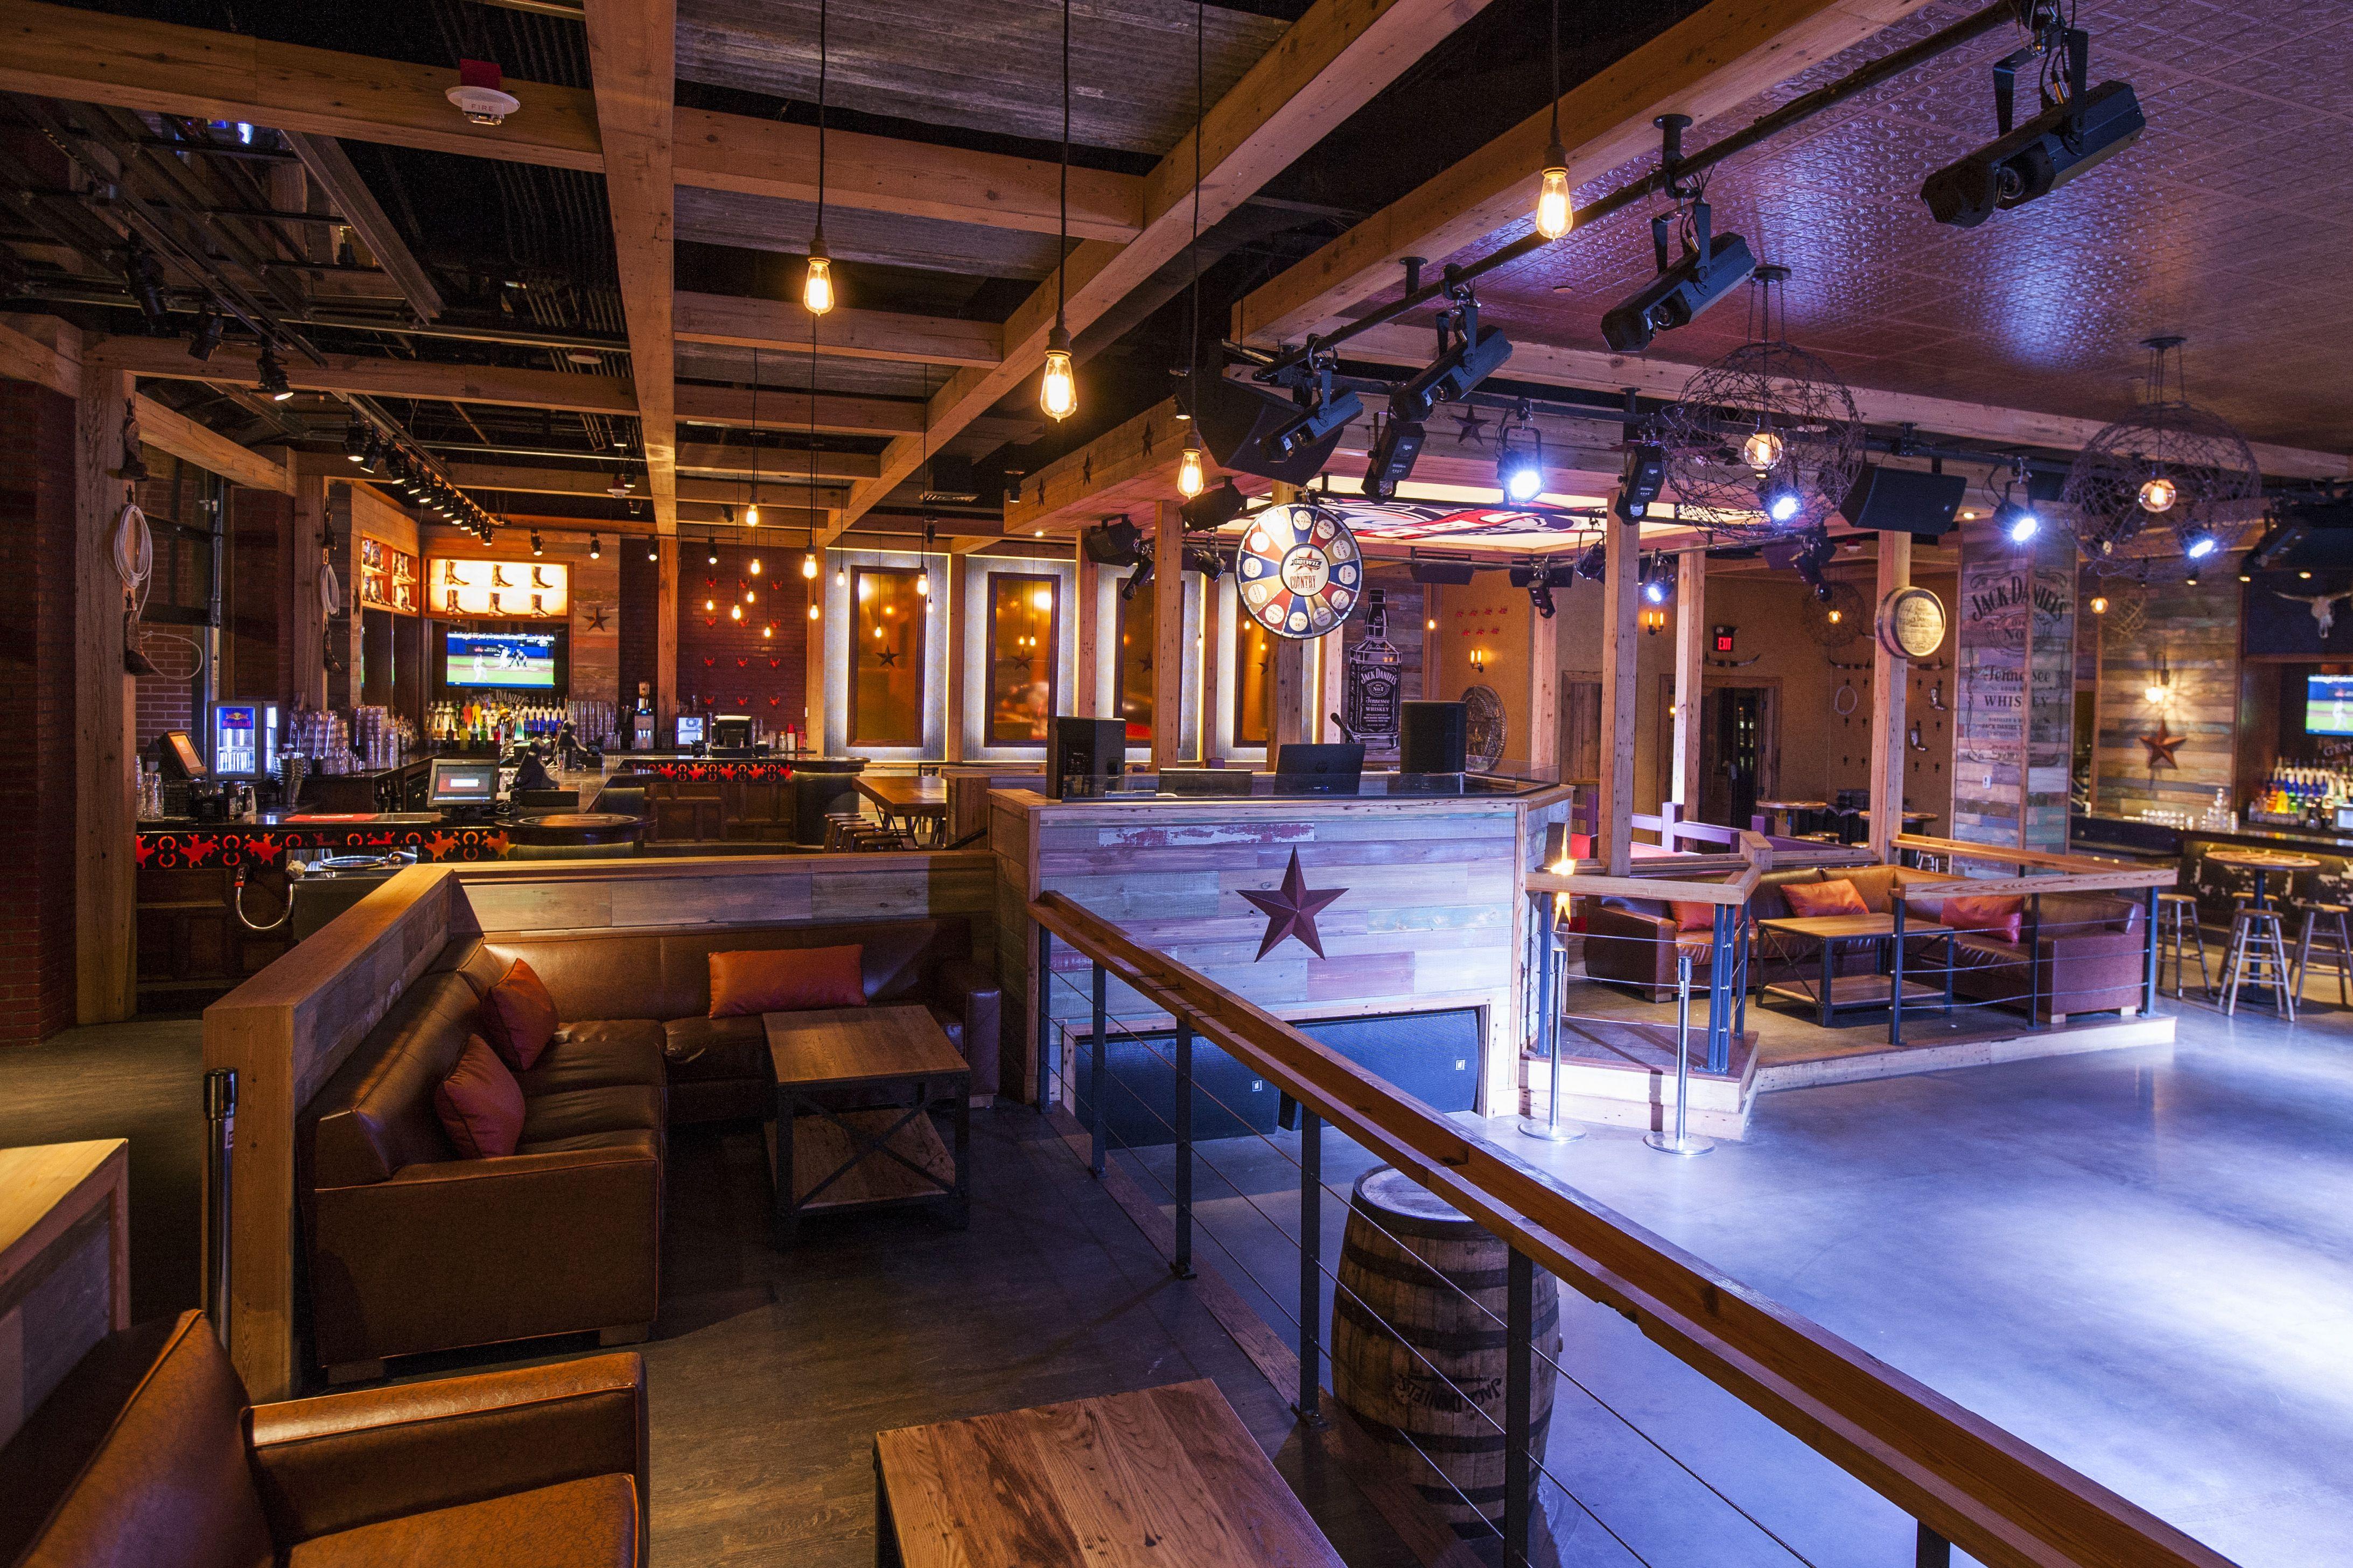 Vip Pbr St Louis Western Restaurant Country Bar Cowboys Bar